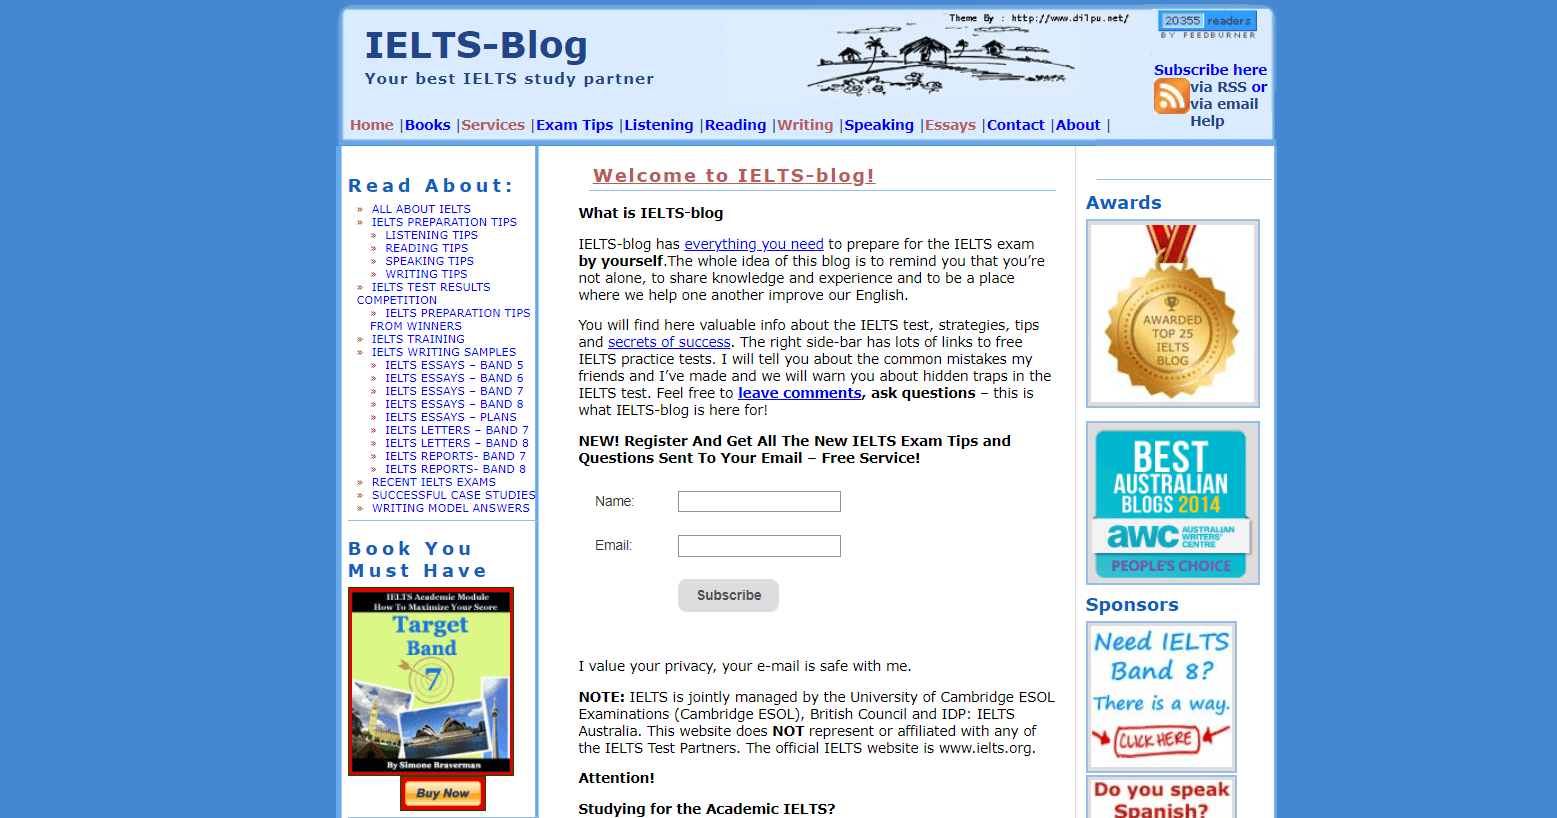 ielts-blog